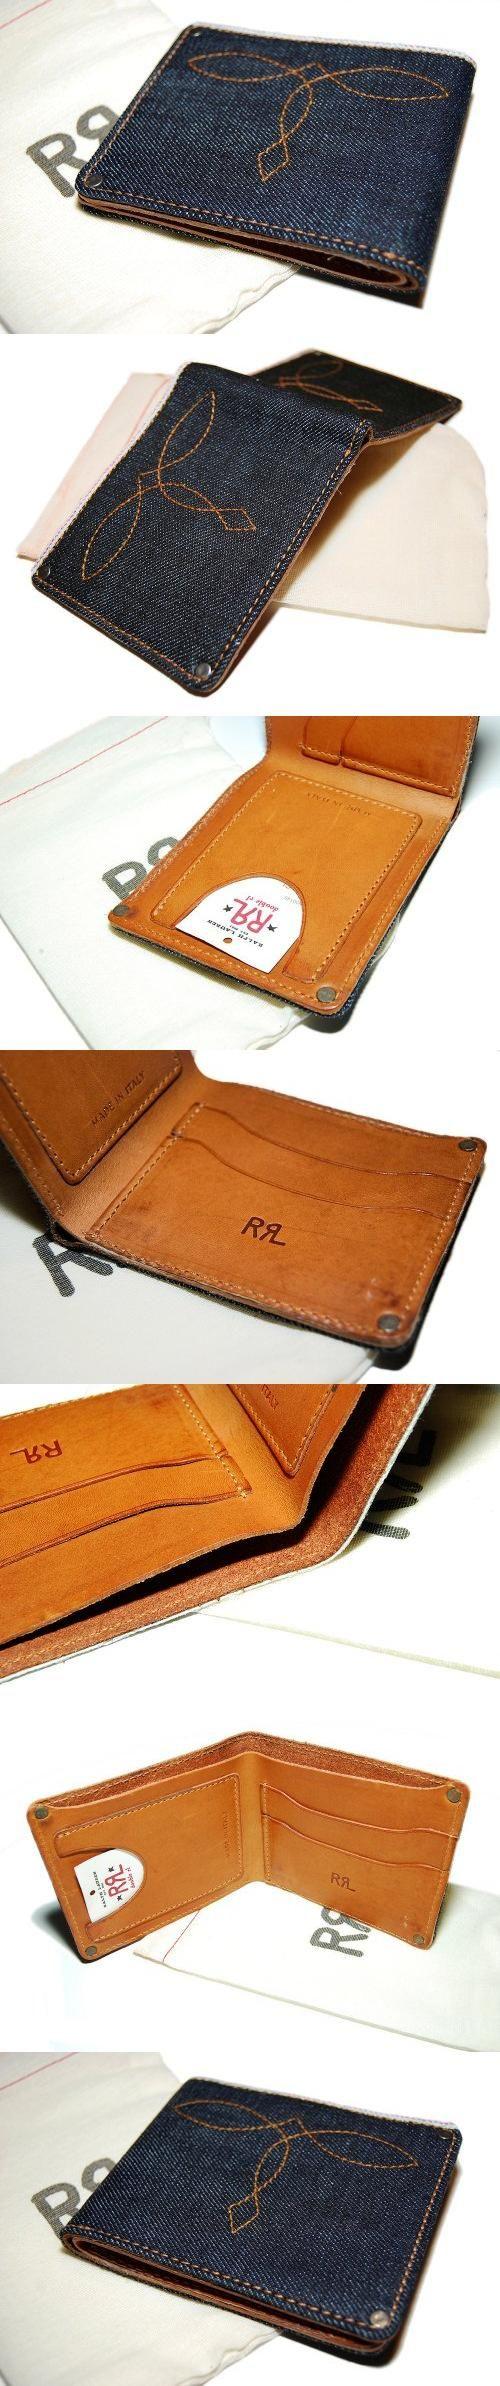 Ralph Lauren RRL Mens Western Vintage Distressed Denim Leather Card Wallet Italy, , #Apparel, #Wallets